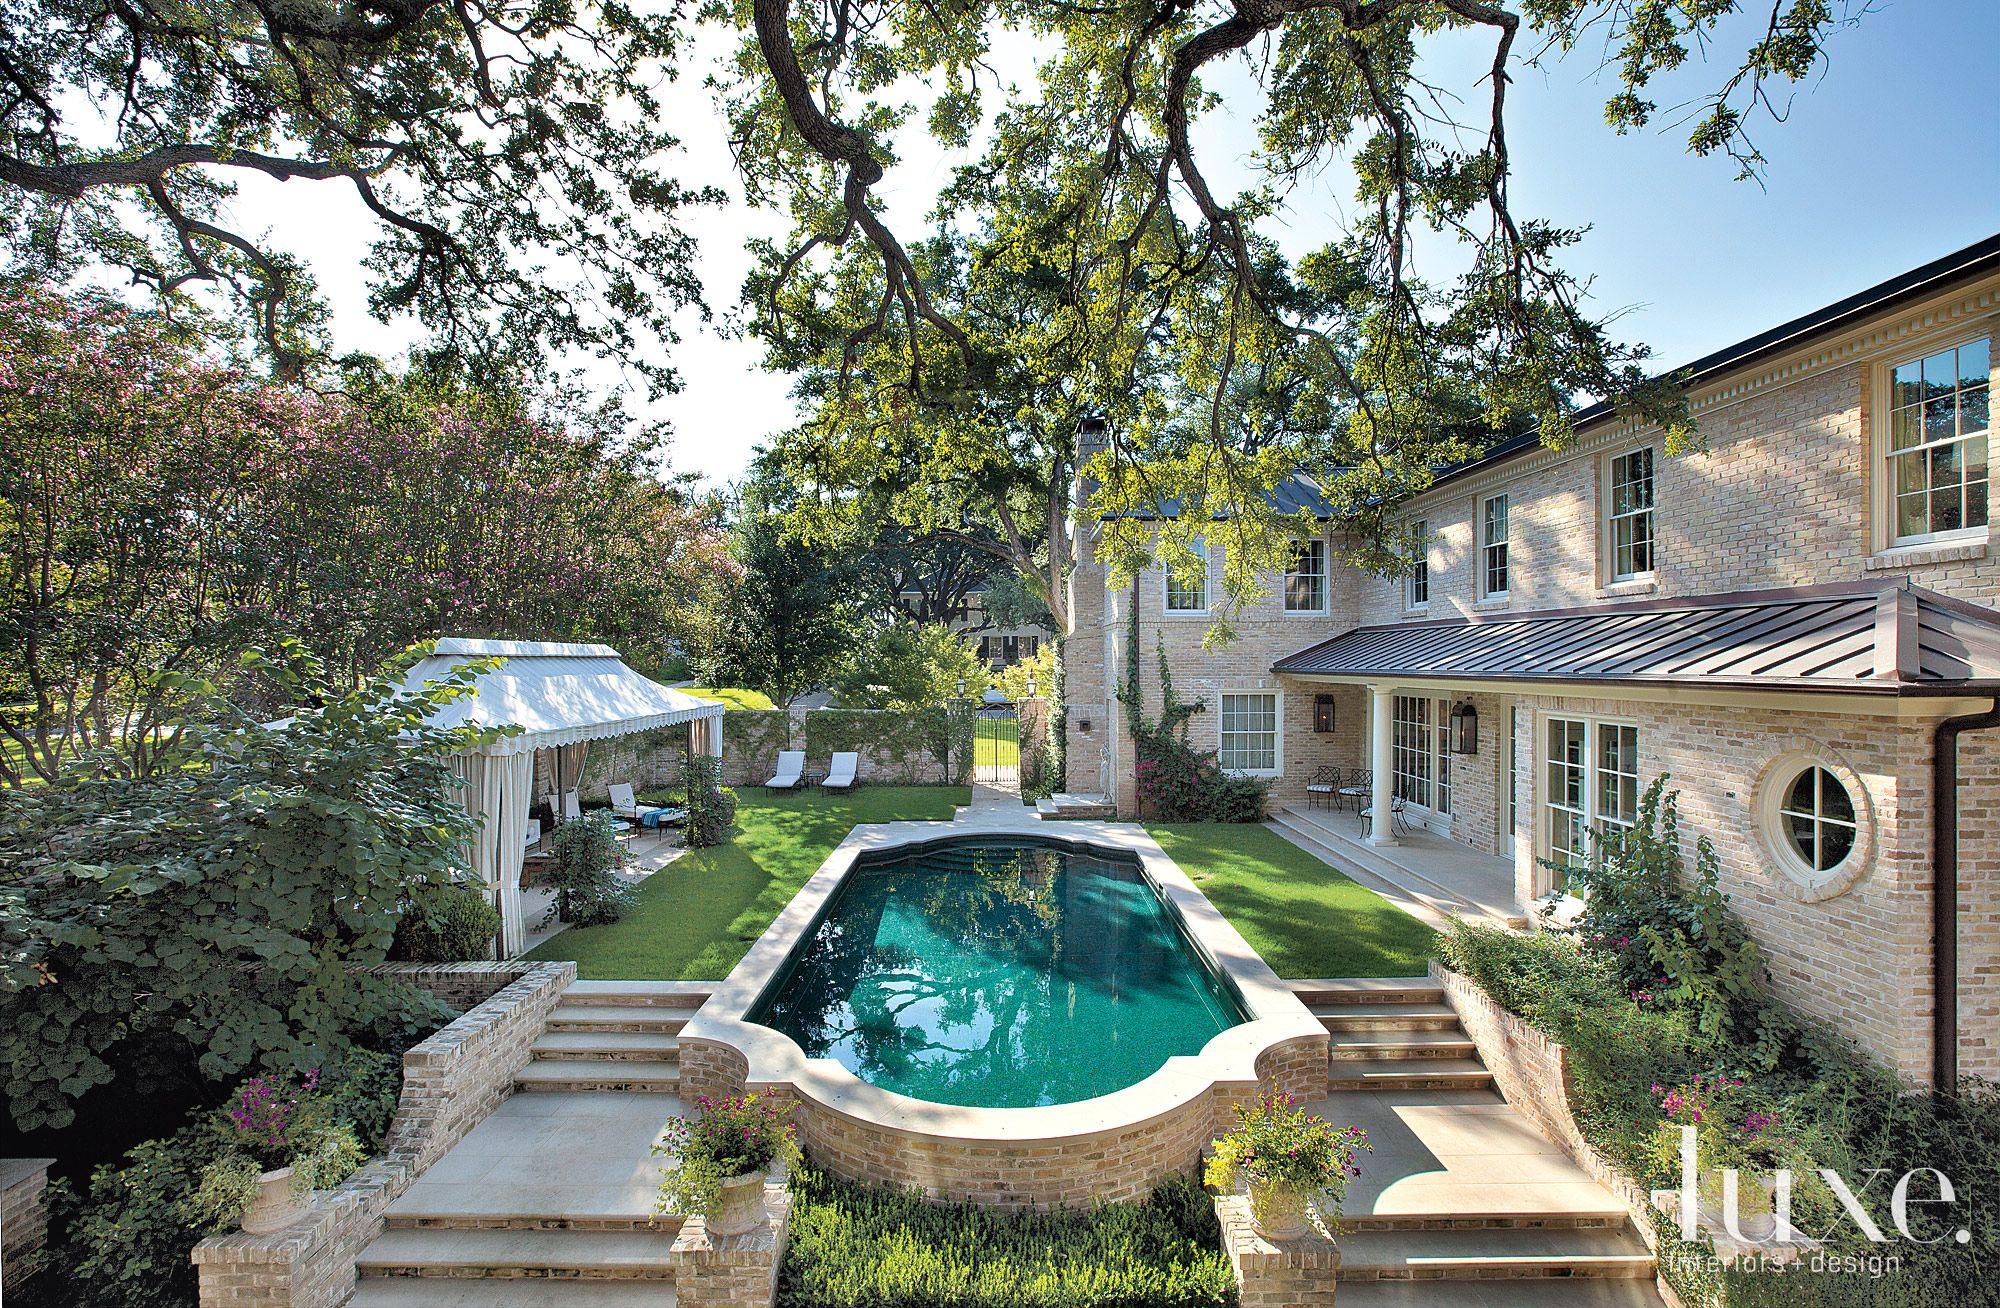 Backyard Restored Poolside Exterior